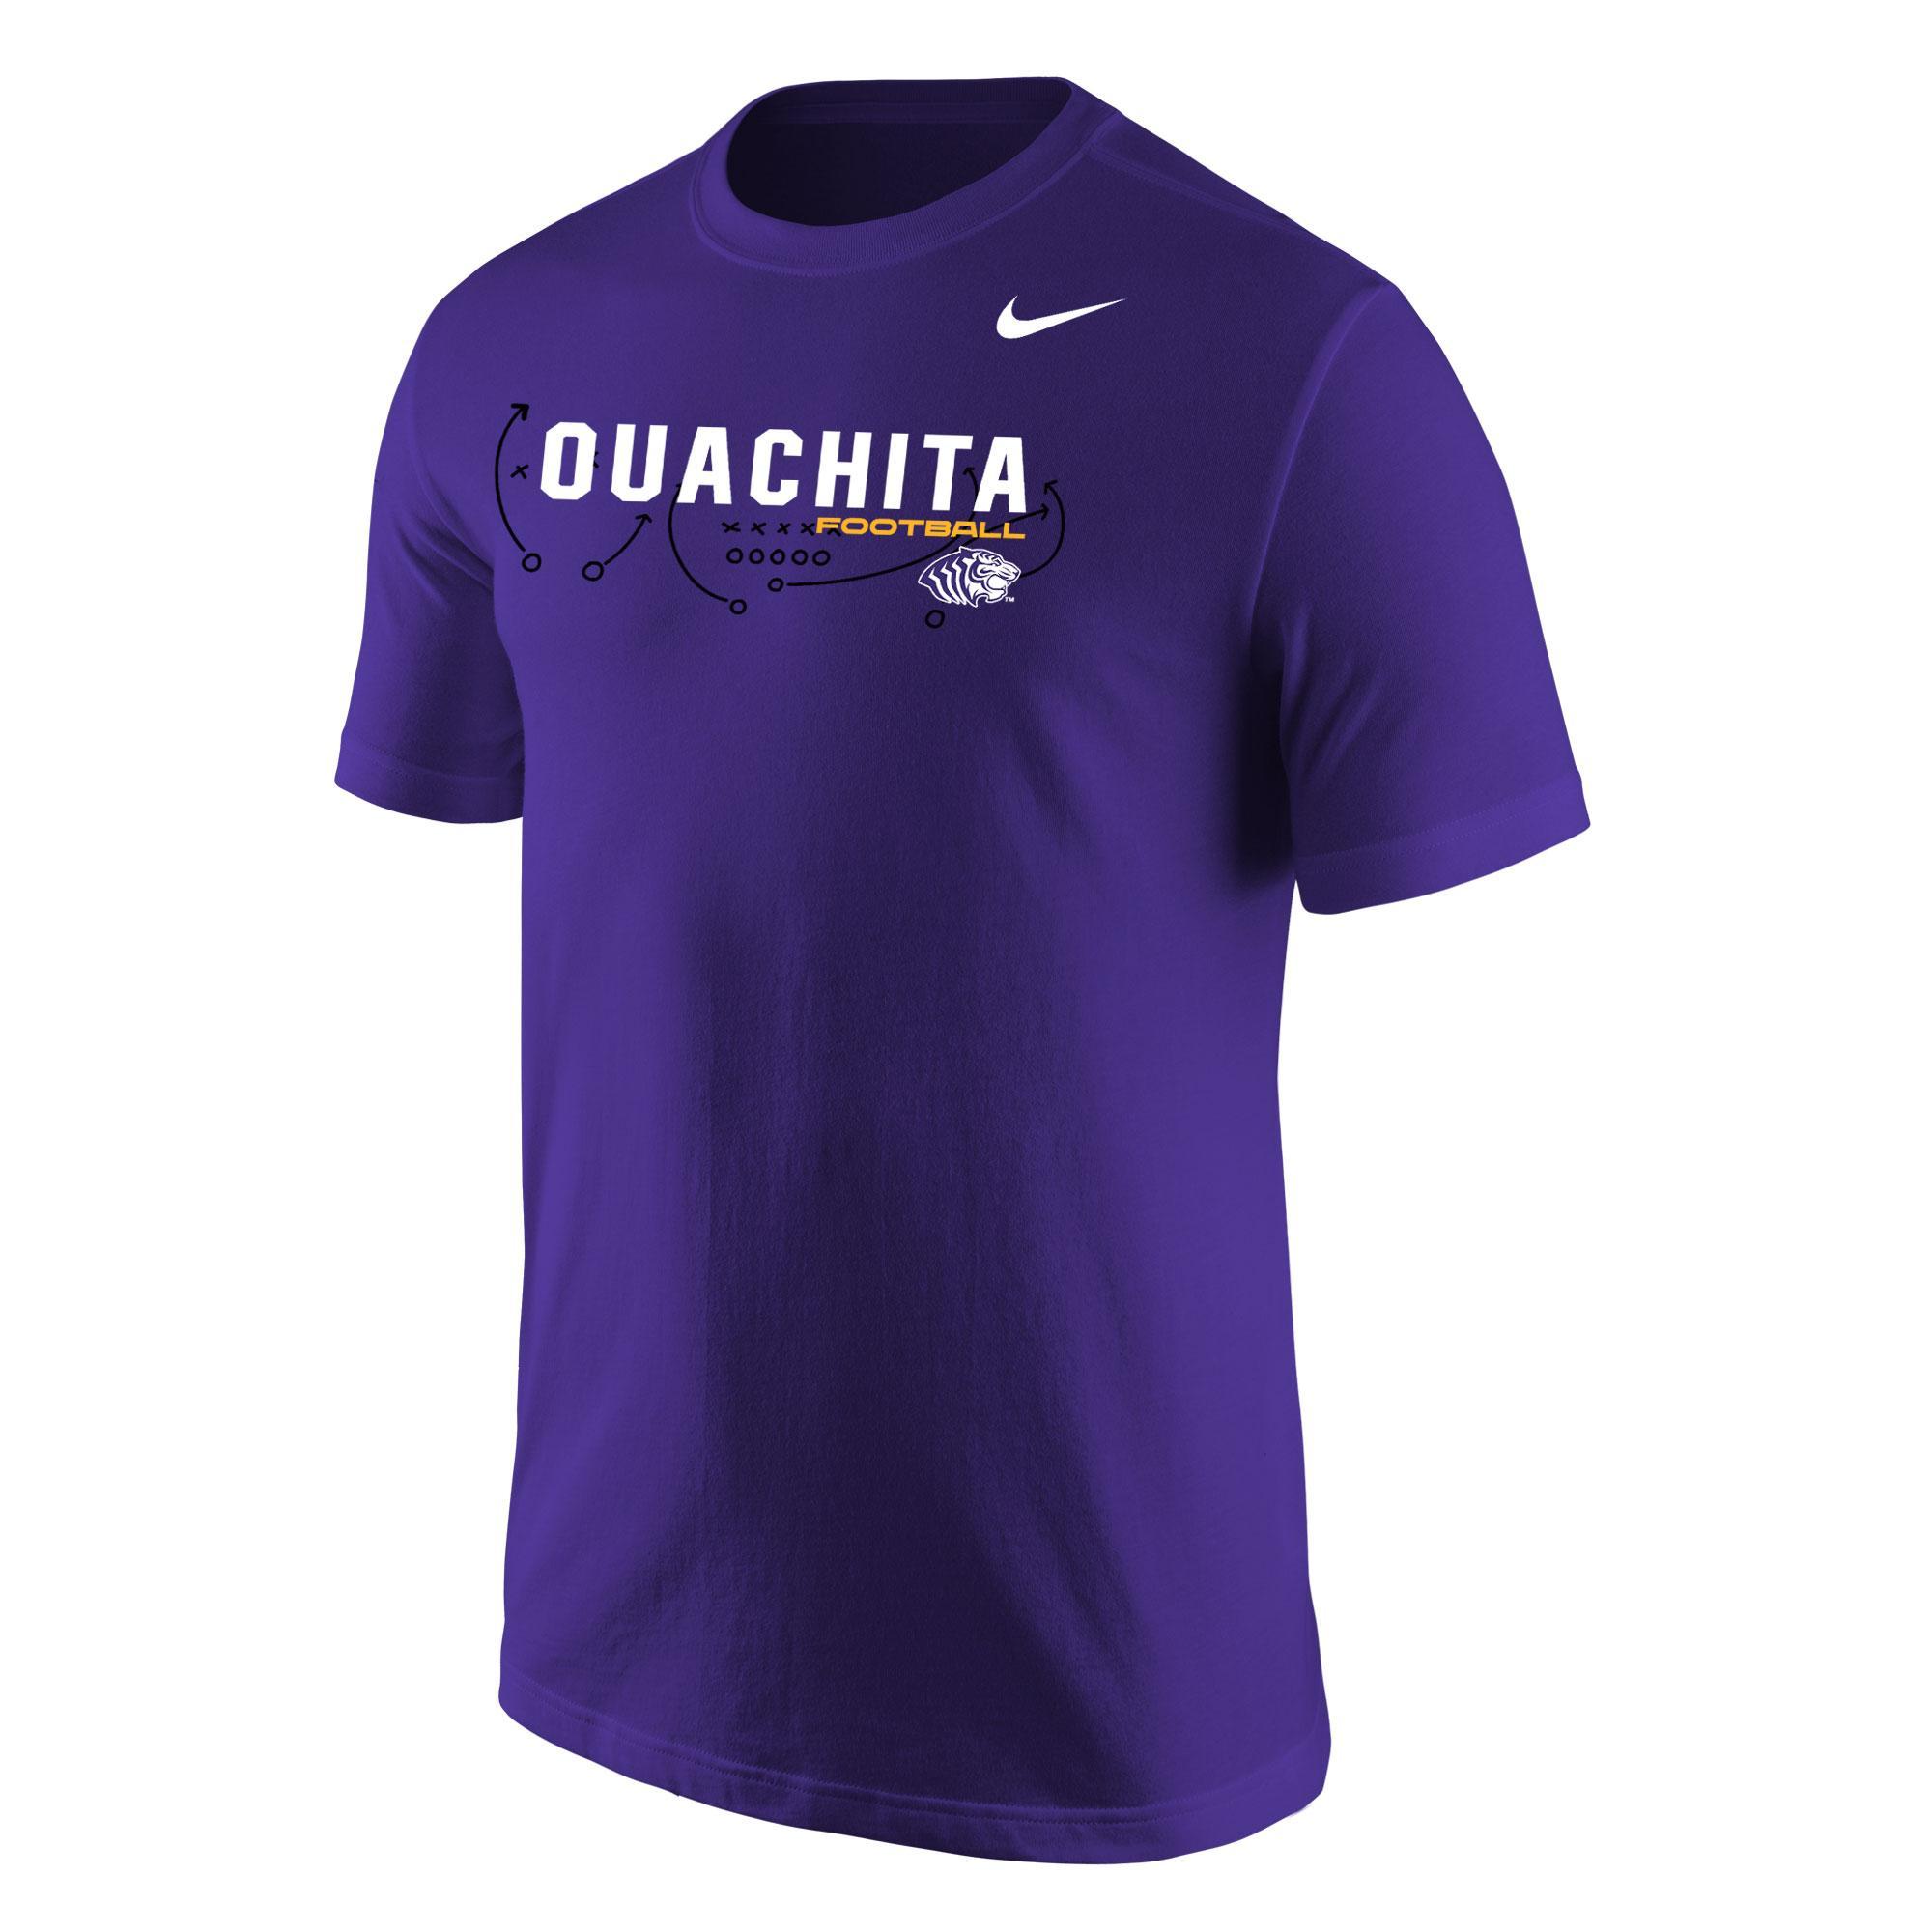 image of: Ouachita Football Play Core SS Tee